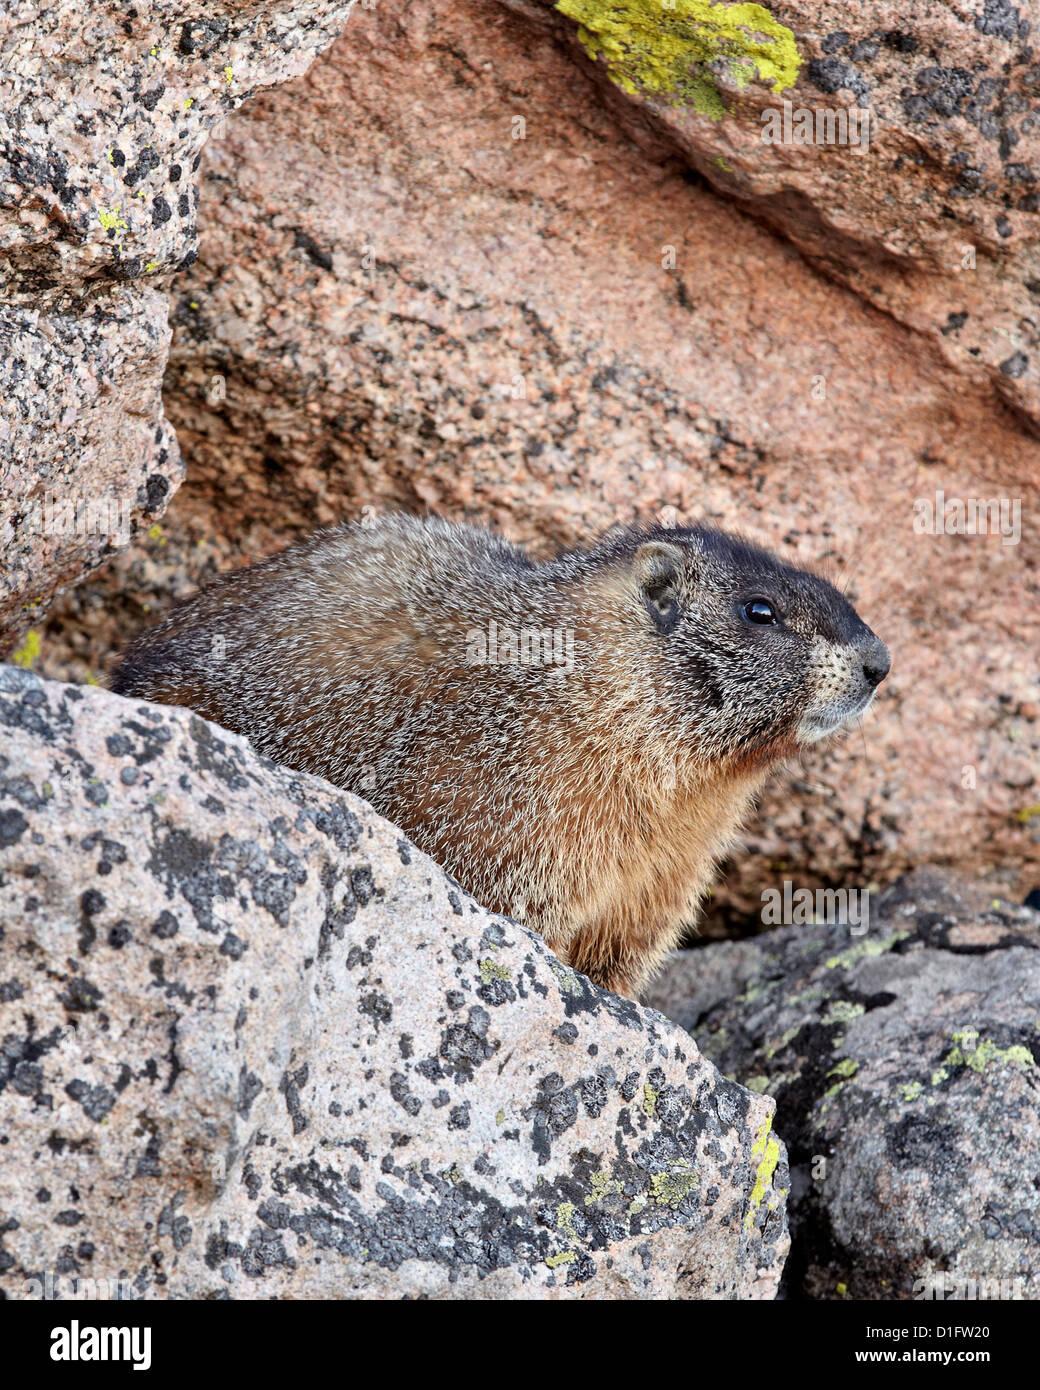 Yellow-bellied marmot (yellowbelly marmot) (Marmota flaviventris), Mount Evans, Arapaho-Roosevelt National Forest, - Stock Image